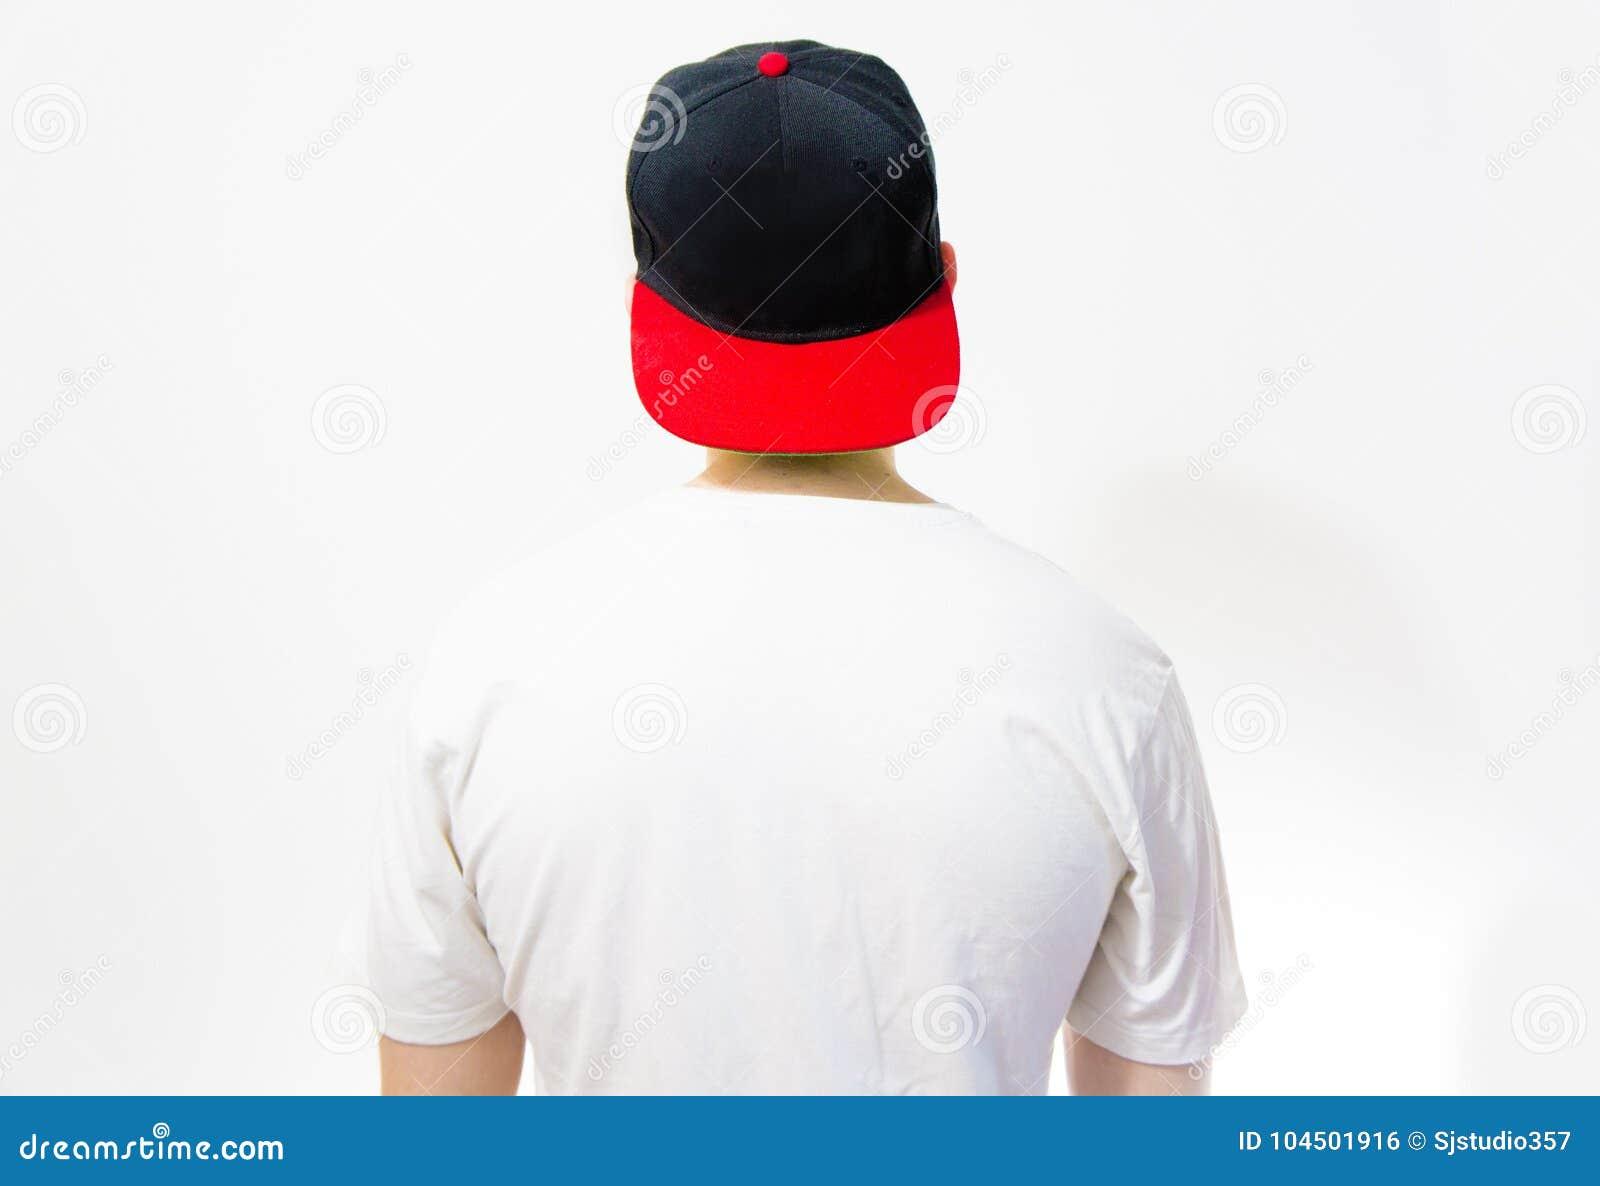 f84fb8c42113 El Hombre, Individuo En La Gorra De Béisbol Negra, Roja En Blanco ...